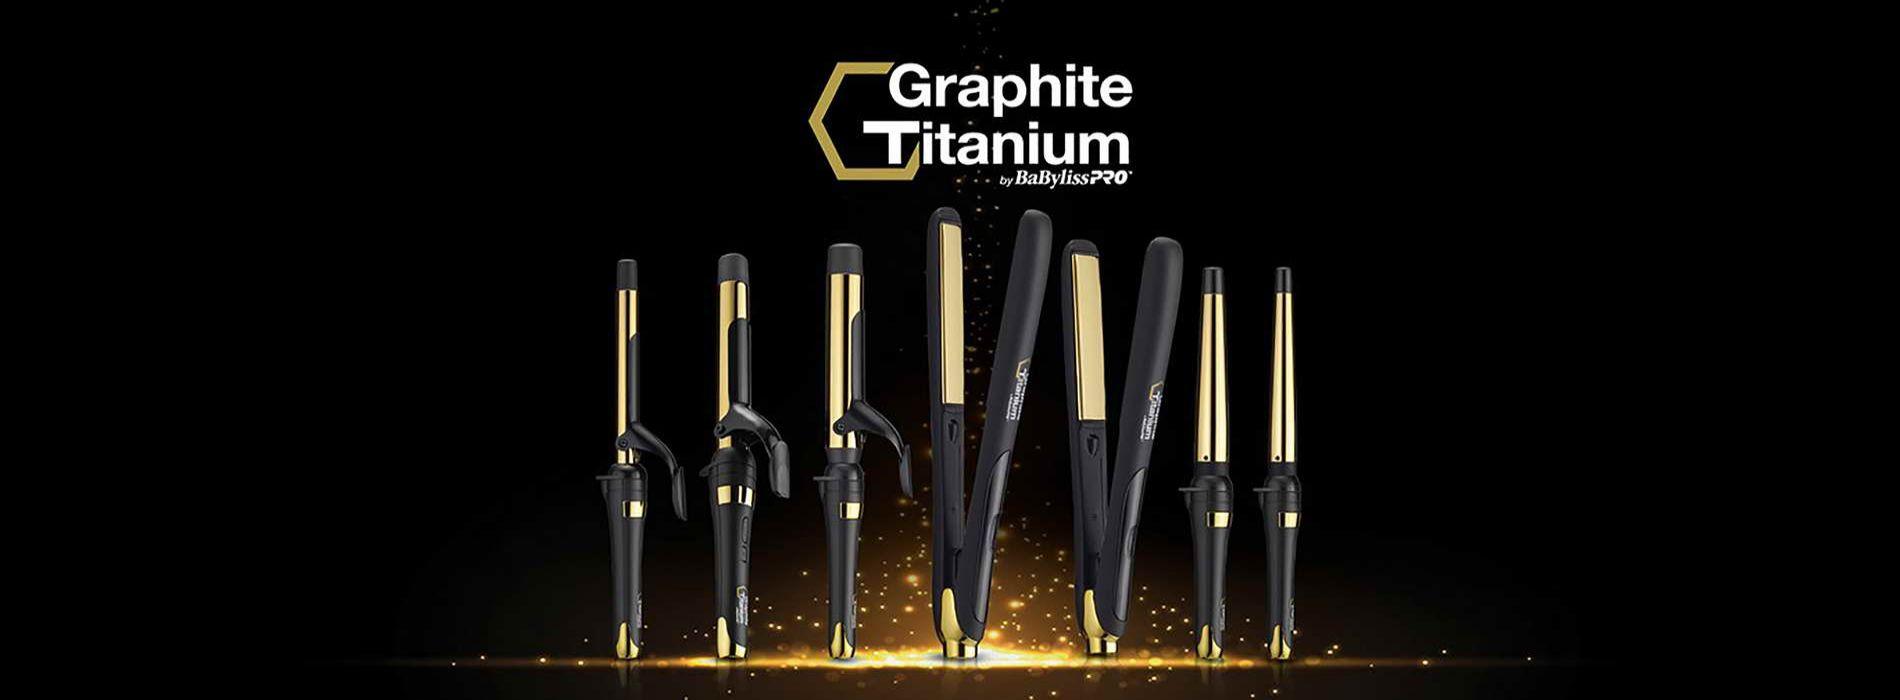 catalogsearch/result/?q=babyliss+pro+graphite+titanium